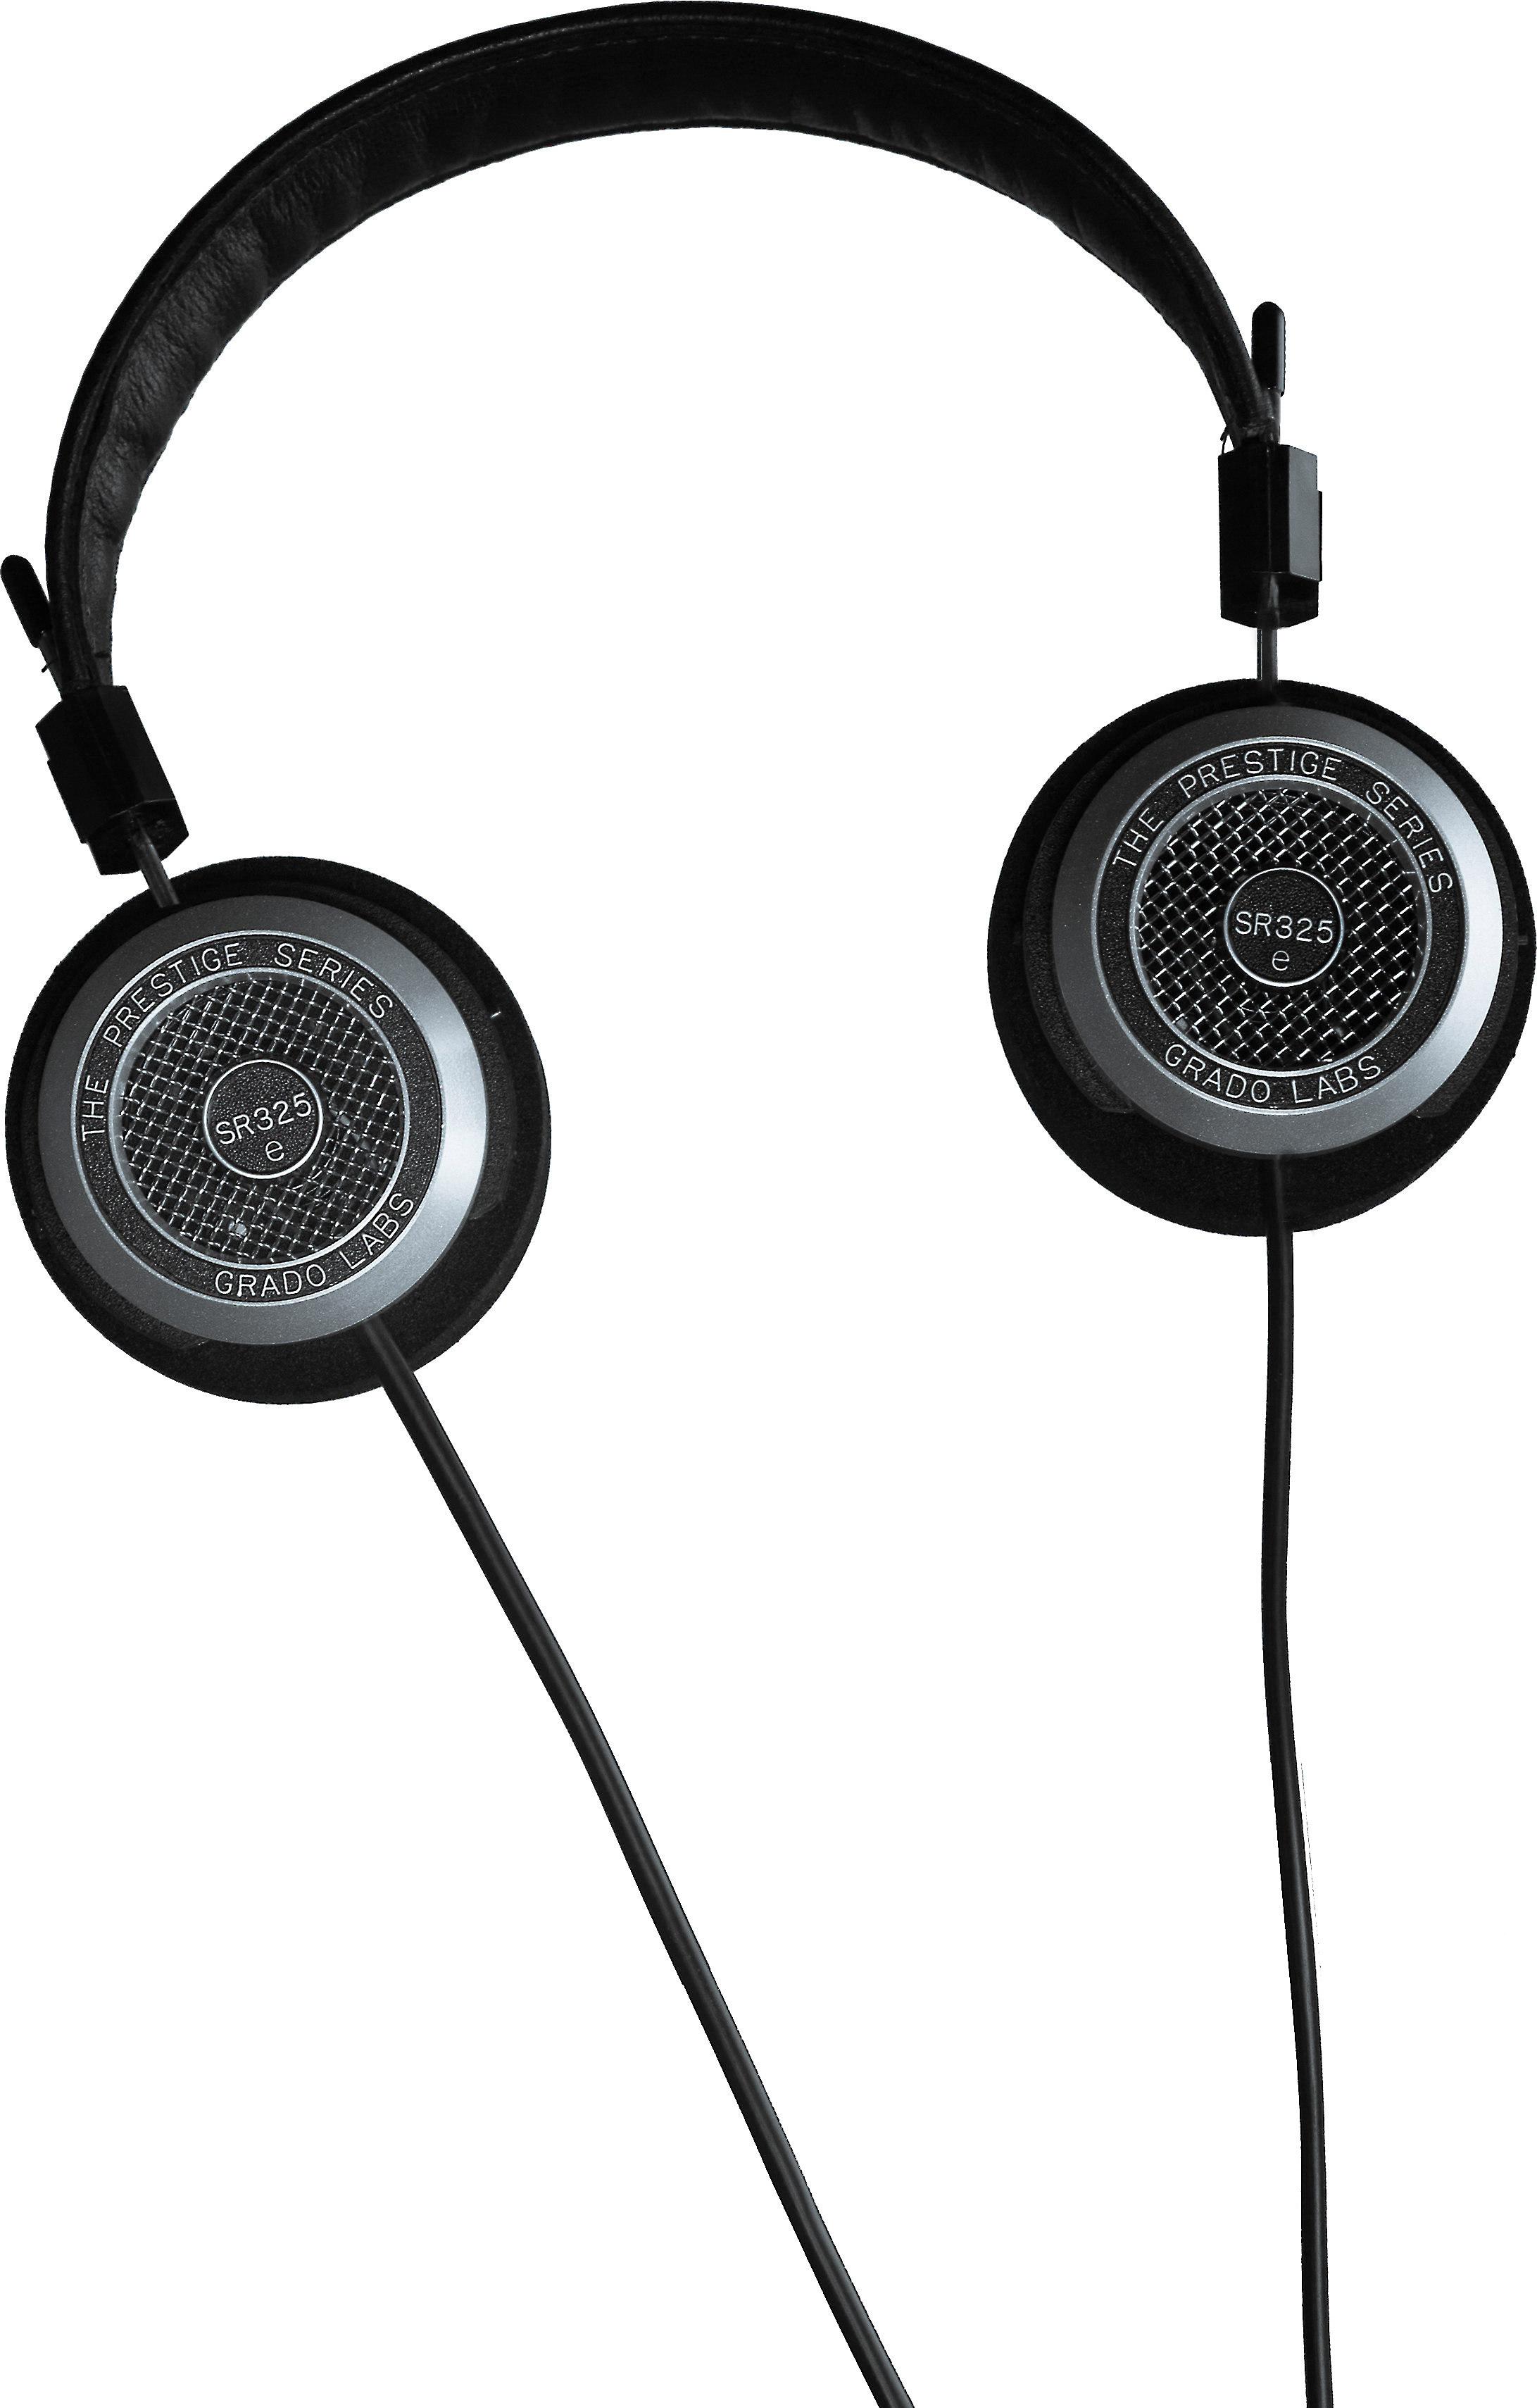 b22066bad52 Grado SR325e Prestige Series on-ear headphones at Crutchfield.com